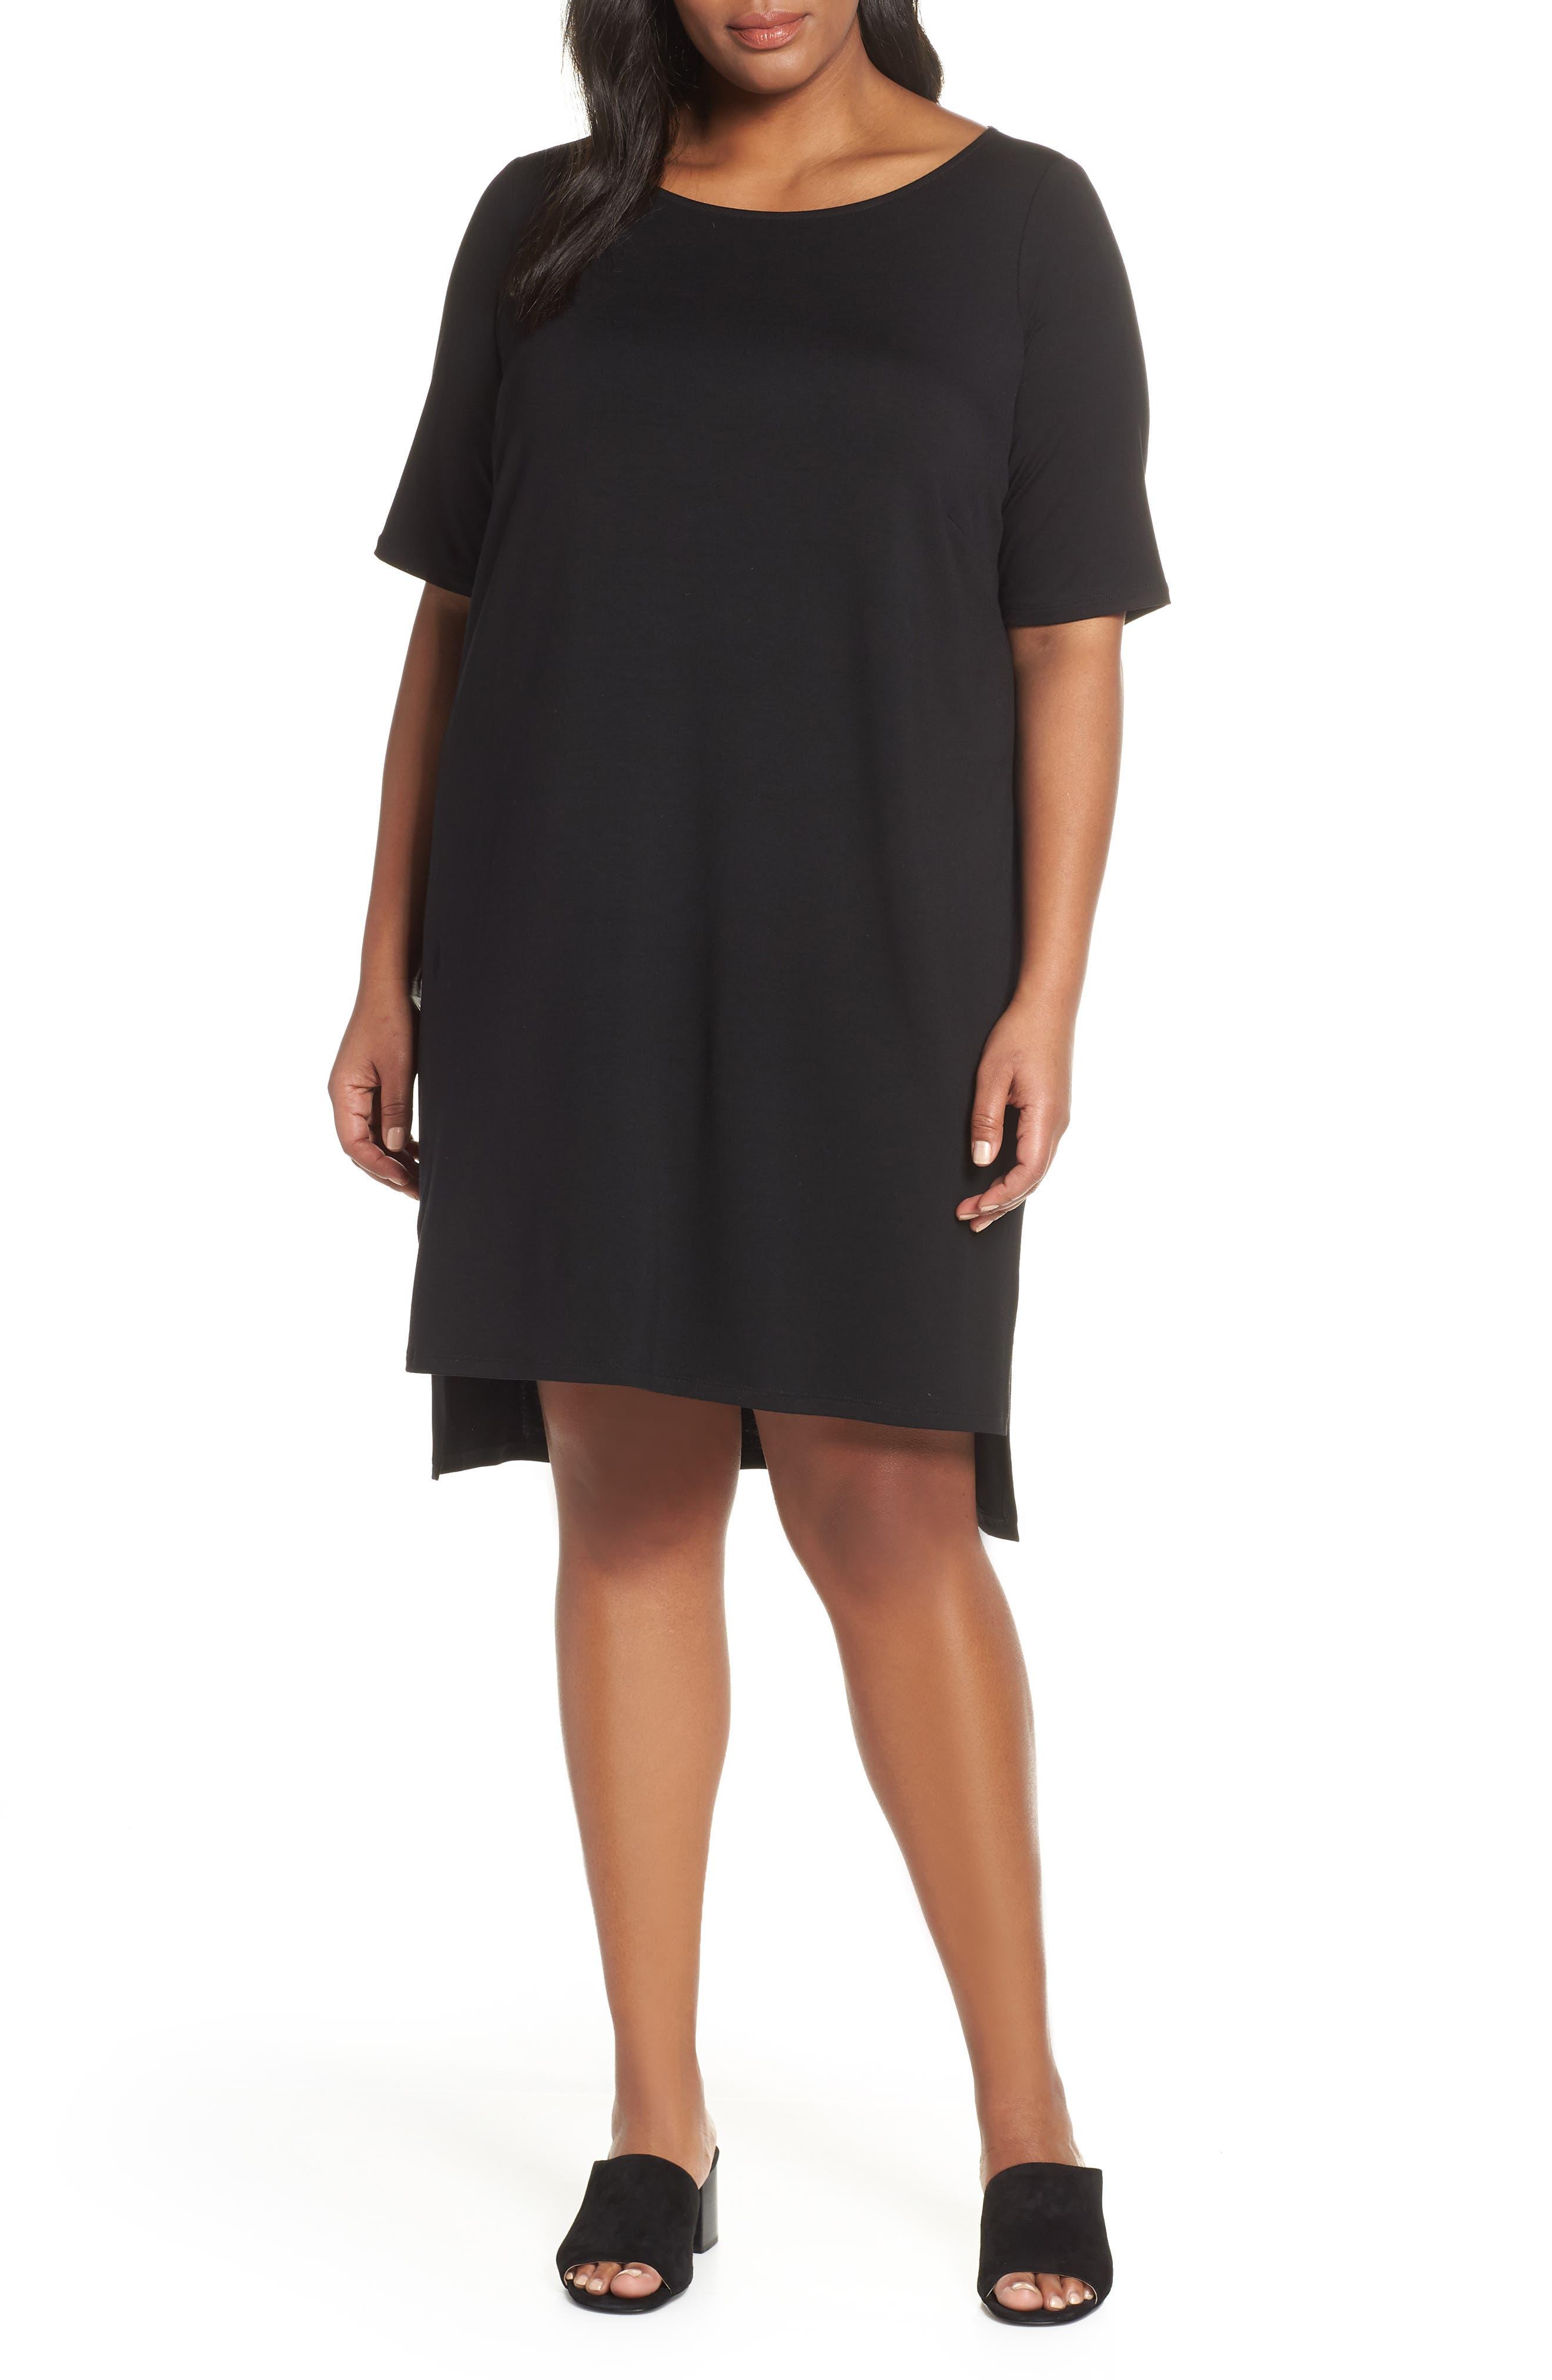 Plus Size Eileen Fisher Organic Cotton Shift Dress, Black